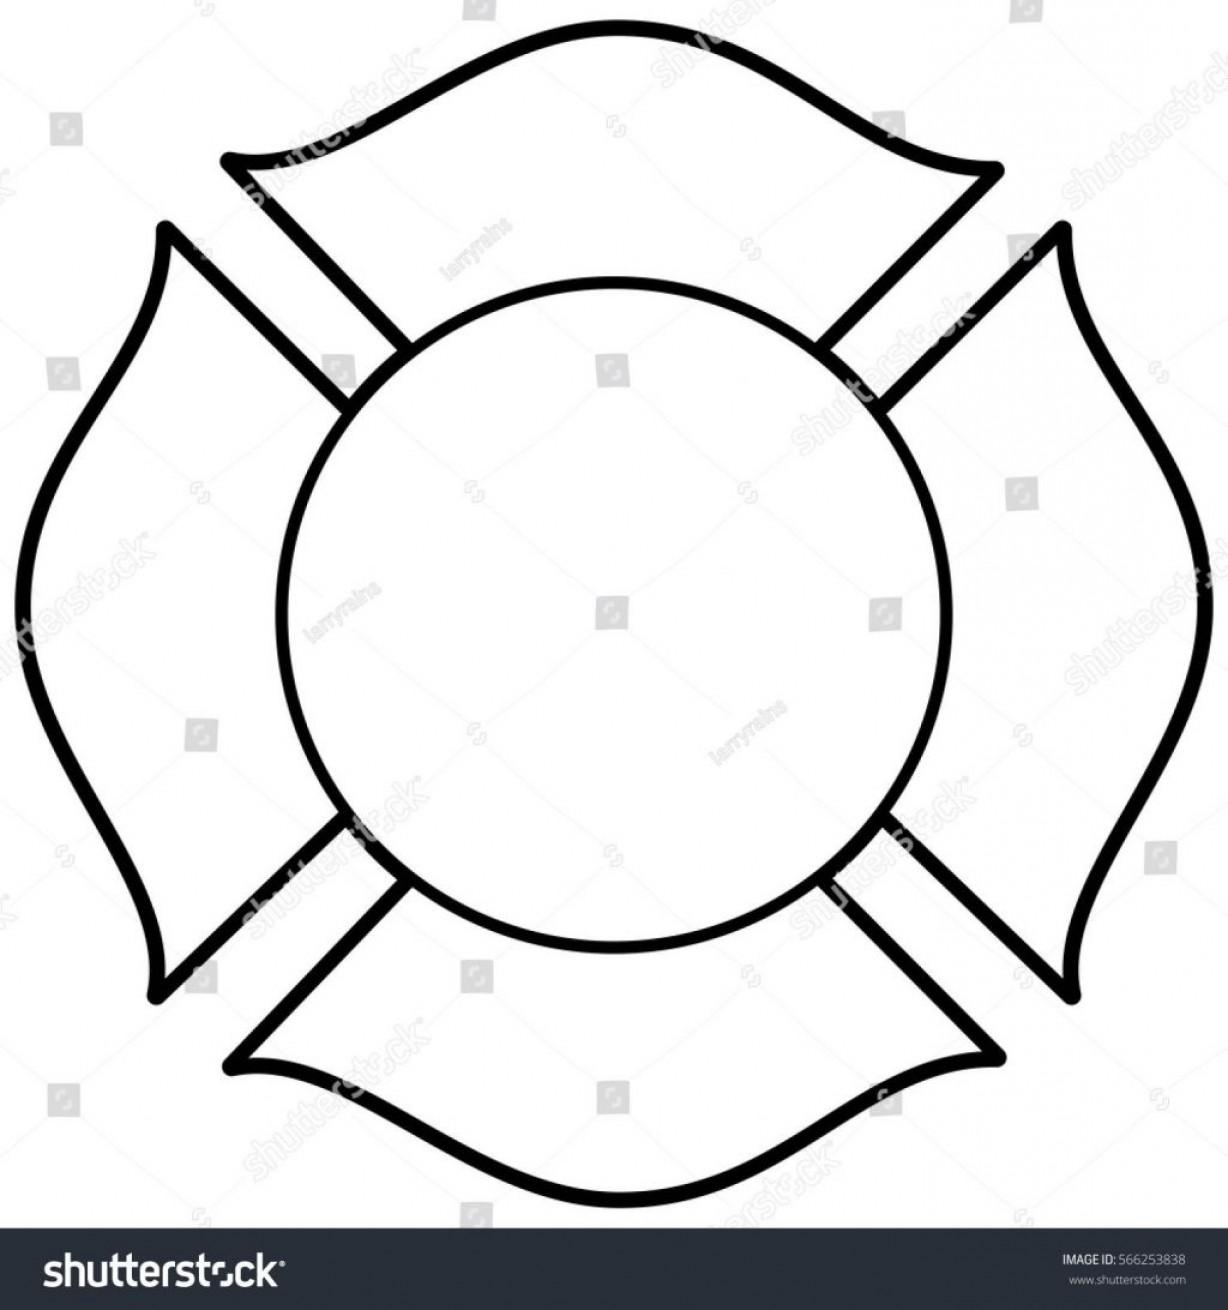 1228x1310 Blank Firefighter Maltese Cross Vector Sohadacouri